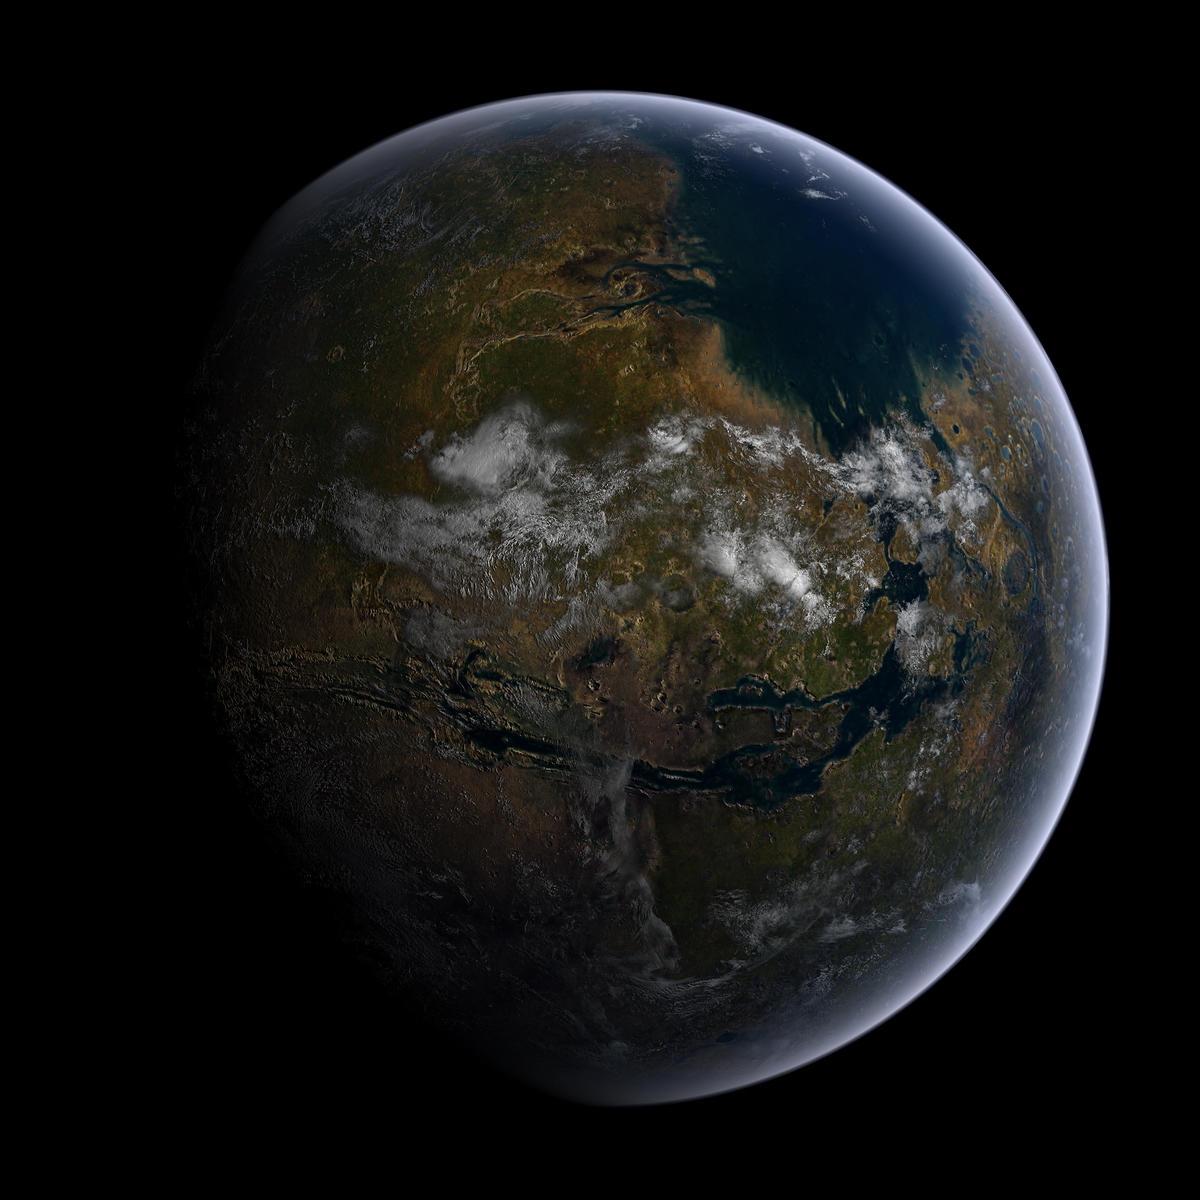 Mars - just add water by hoevelkamp